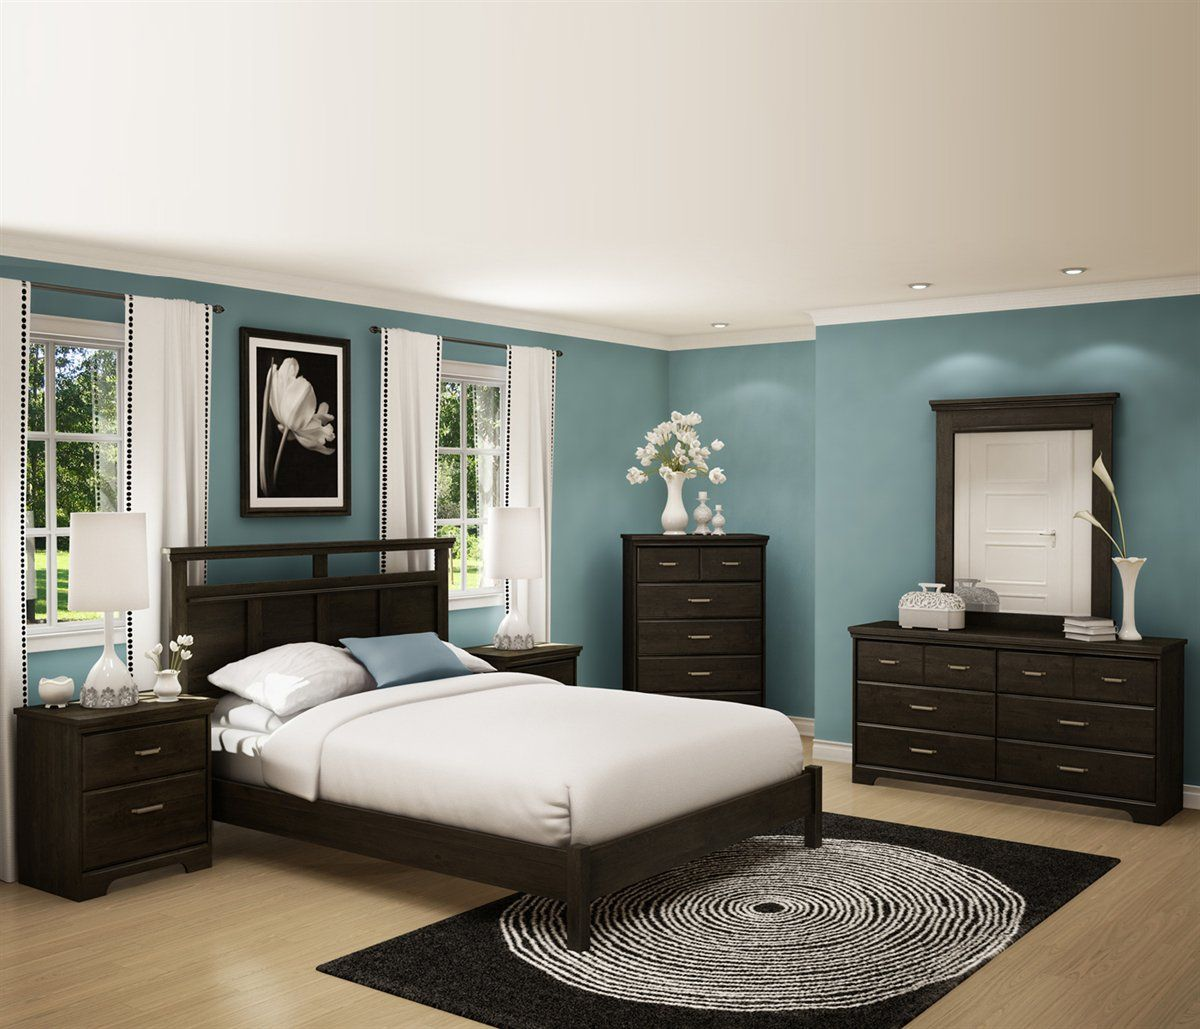 Shop South Shore Furniture 3577203 Gravity Platform Bed at ...